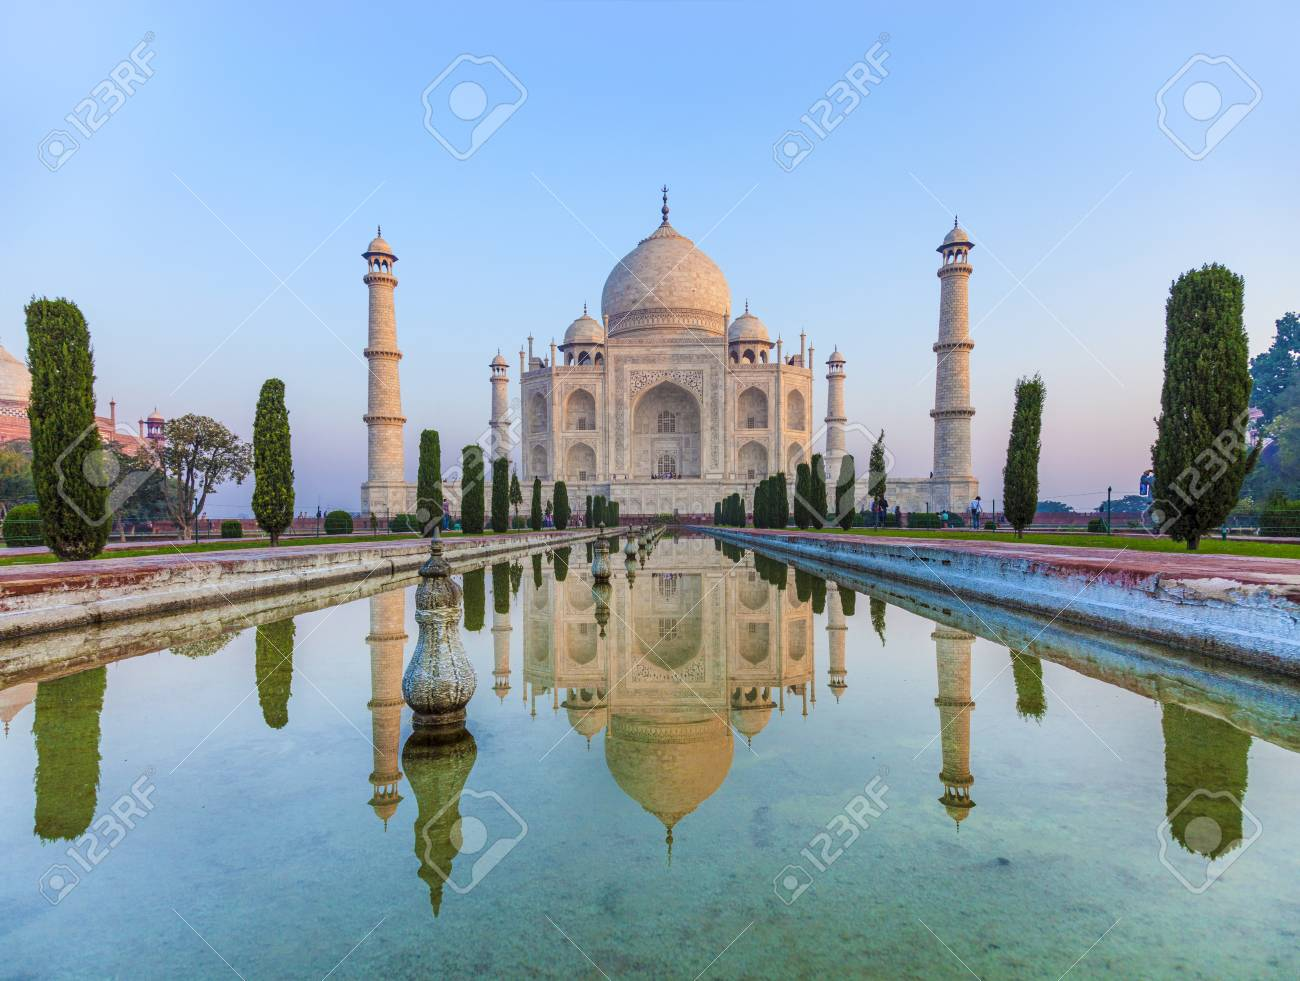 Taj Mahal in India - 71609273